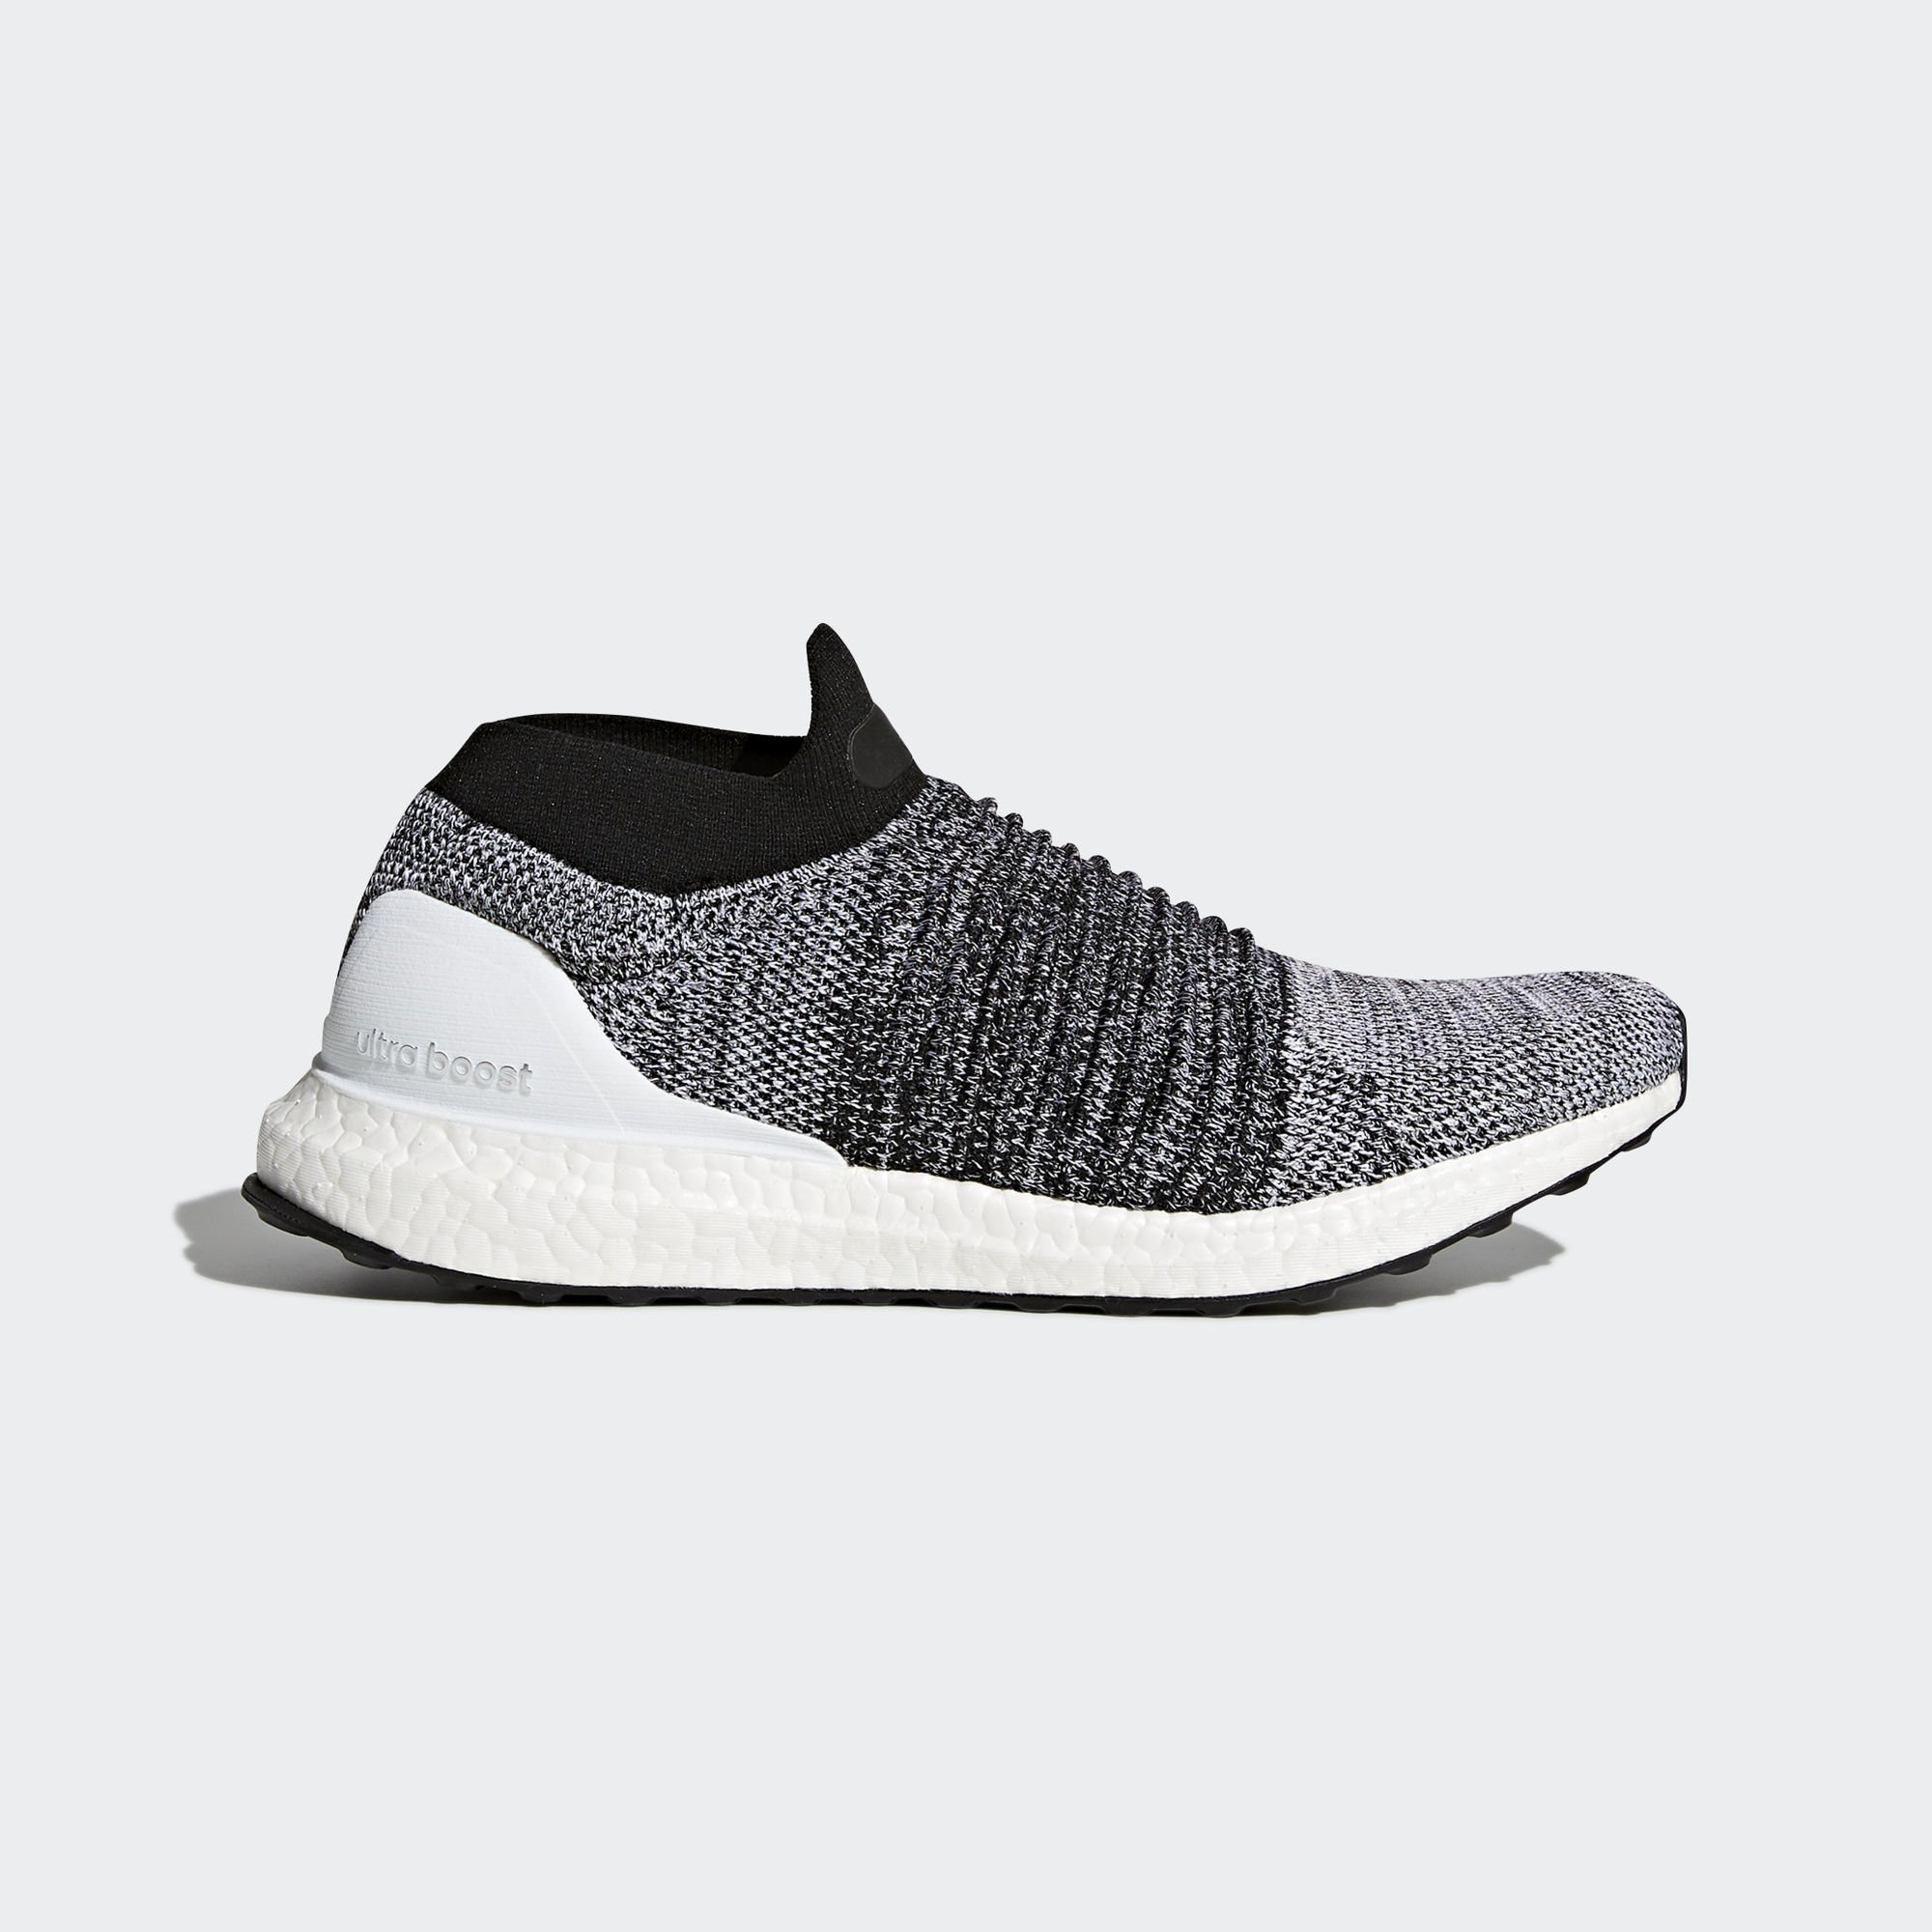 adidas Ultra Boost Laceless Black White (BB6141)